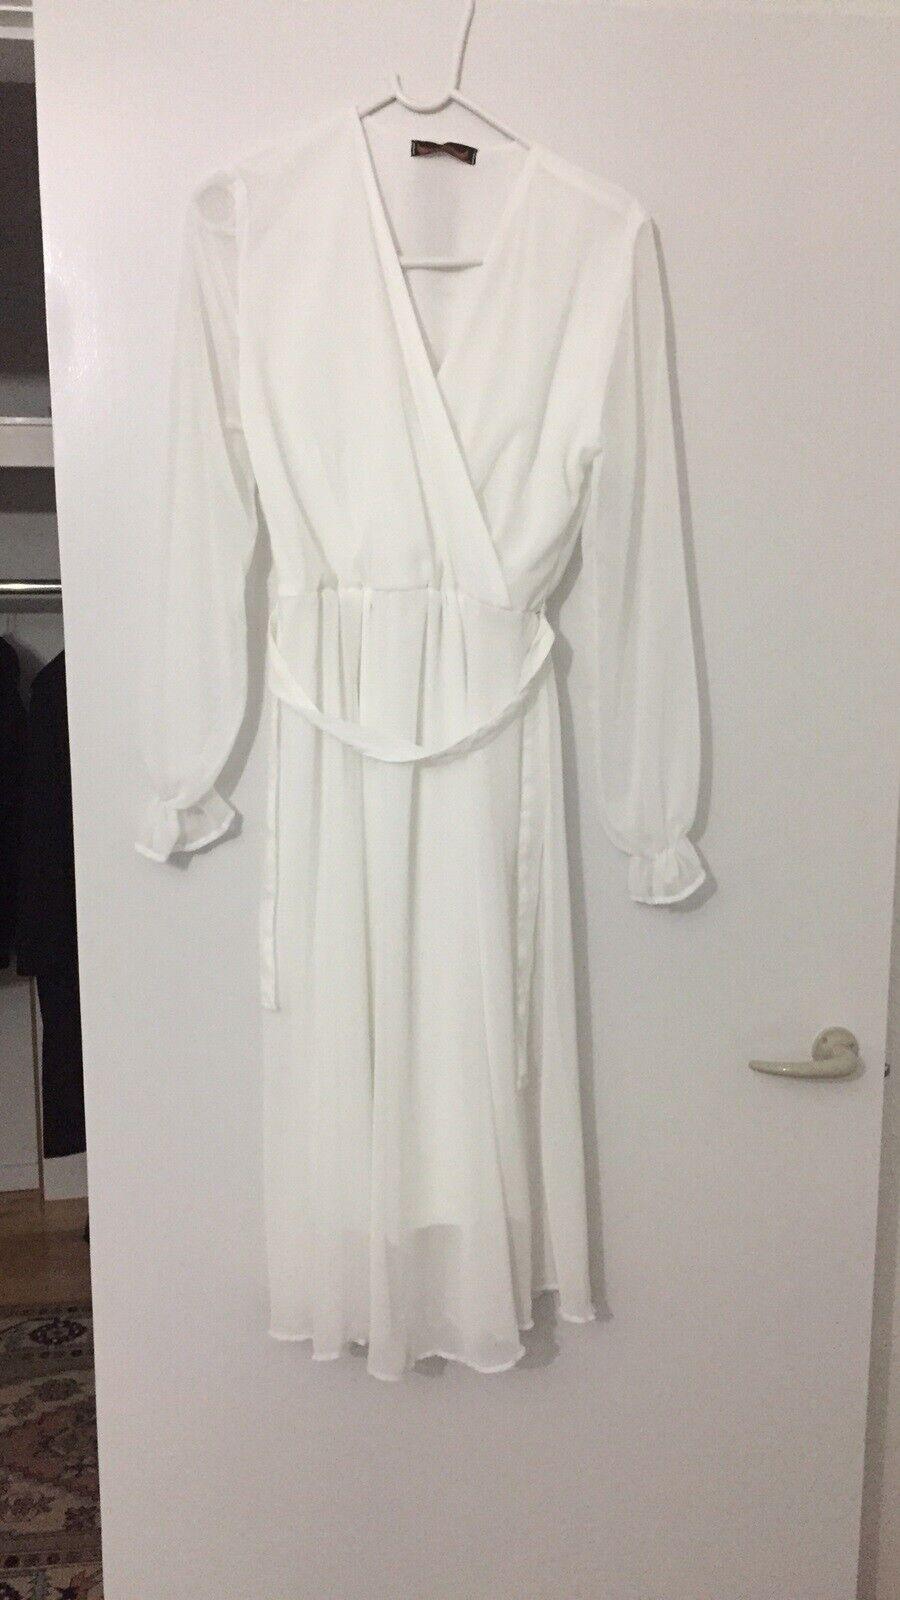 Anden kjole, Storm, str. M